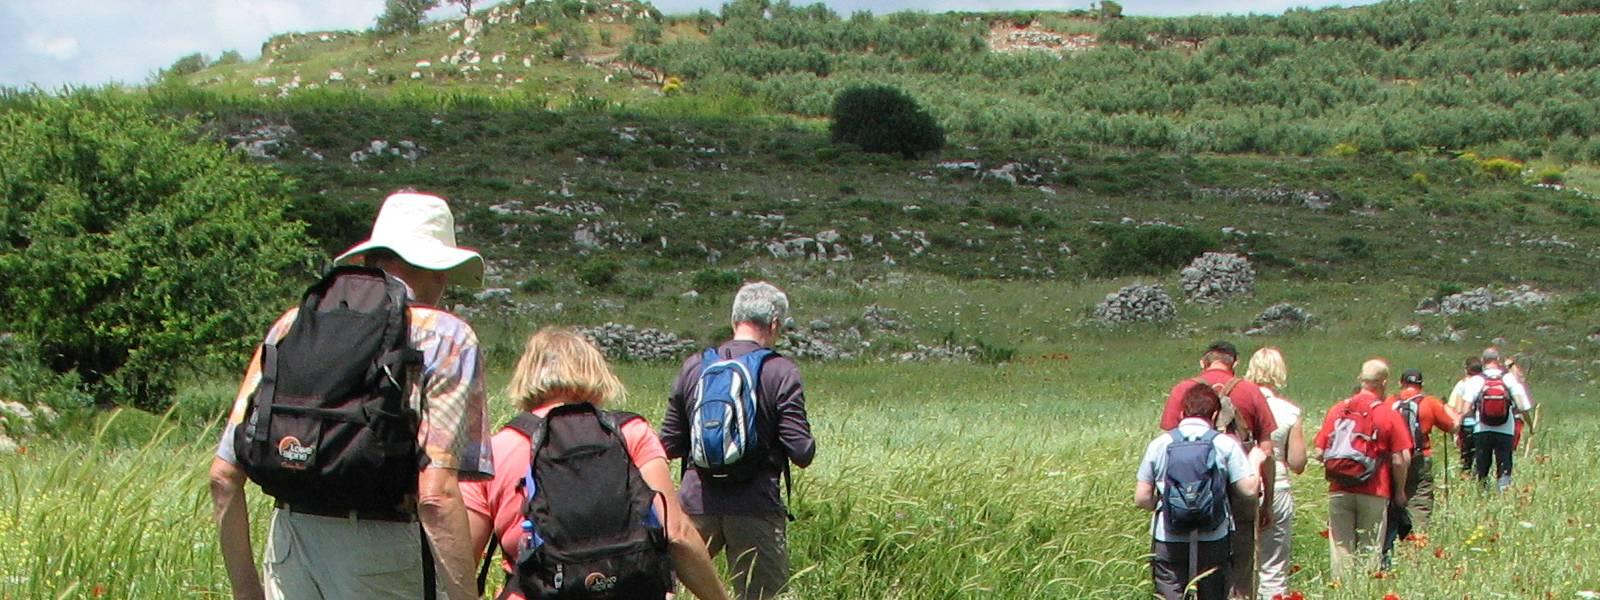 walking1 1600x600 - WALKING-TOURS-CRETE